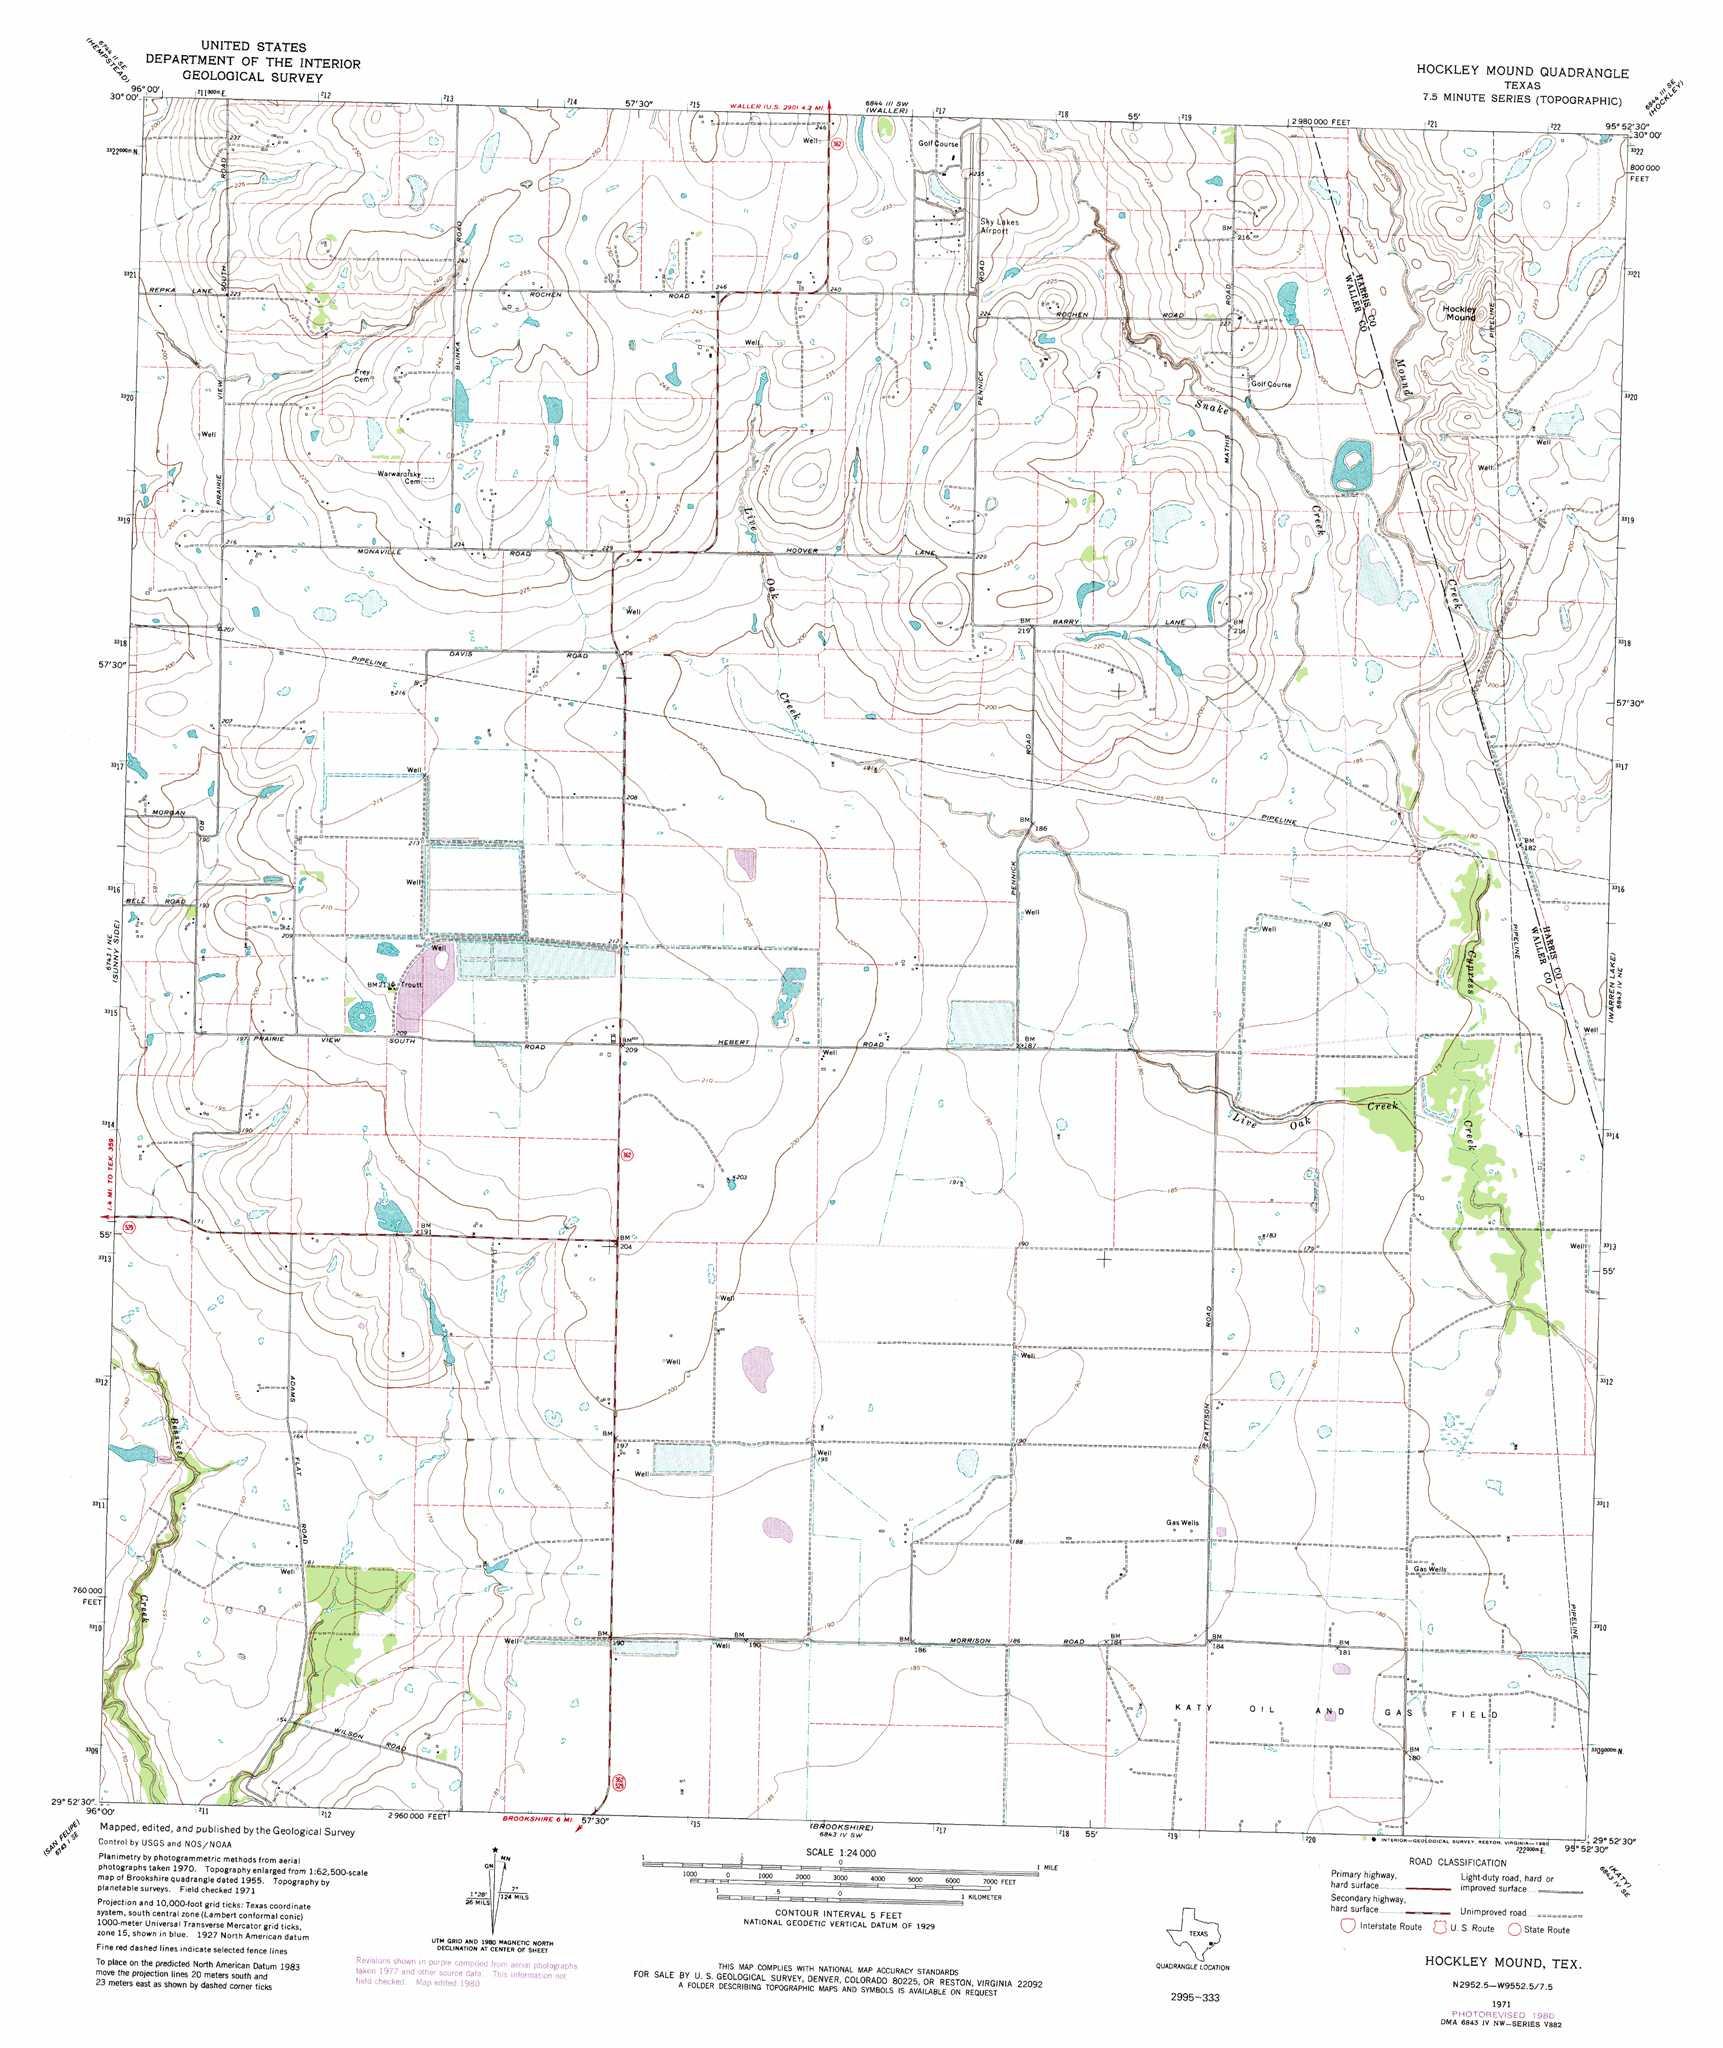 29095h8 further Map Of also Map Of further Map Of also Dlpark2 blogspot. on delaware state on usa map